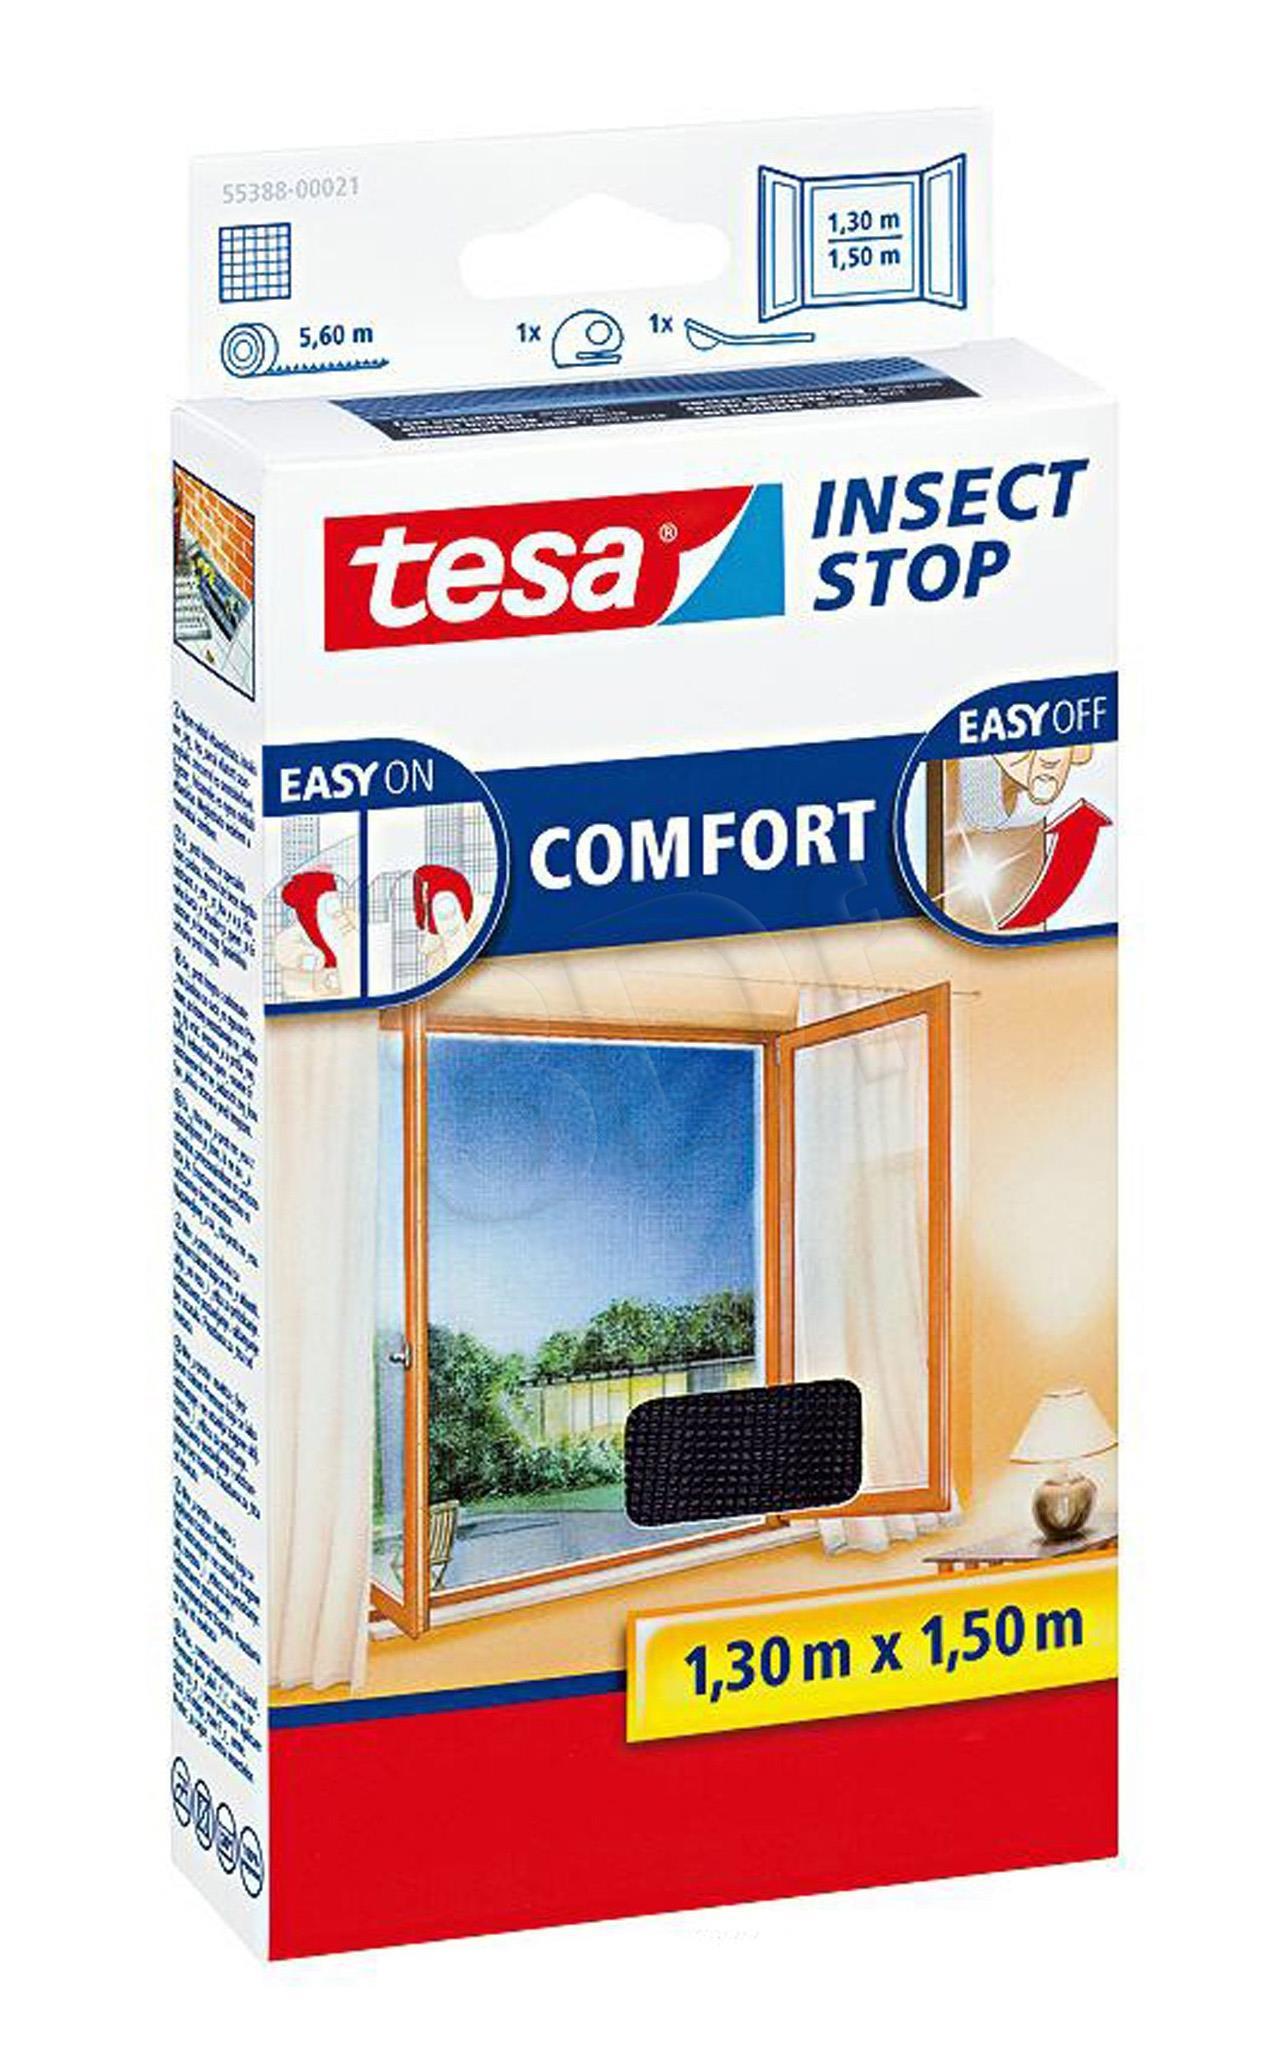 TESA Insect Stop Comfort mosquito net Window White Slazds